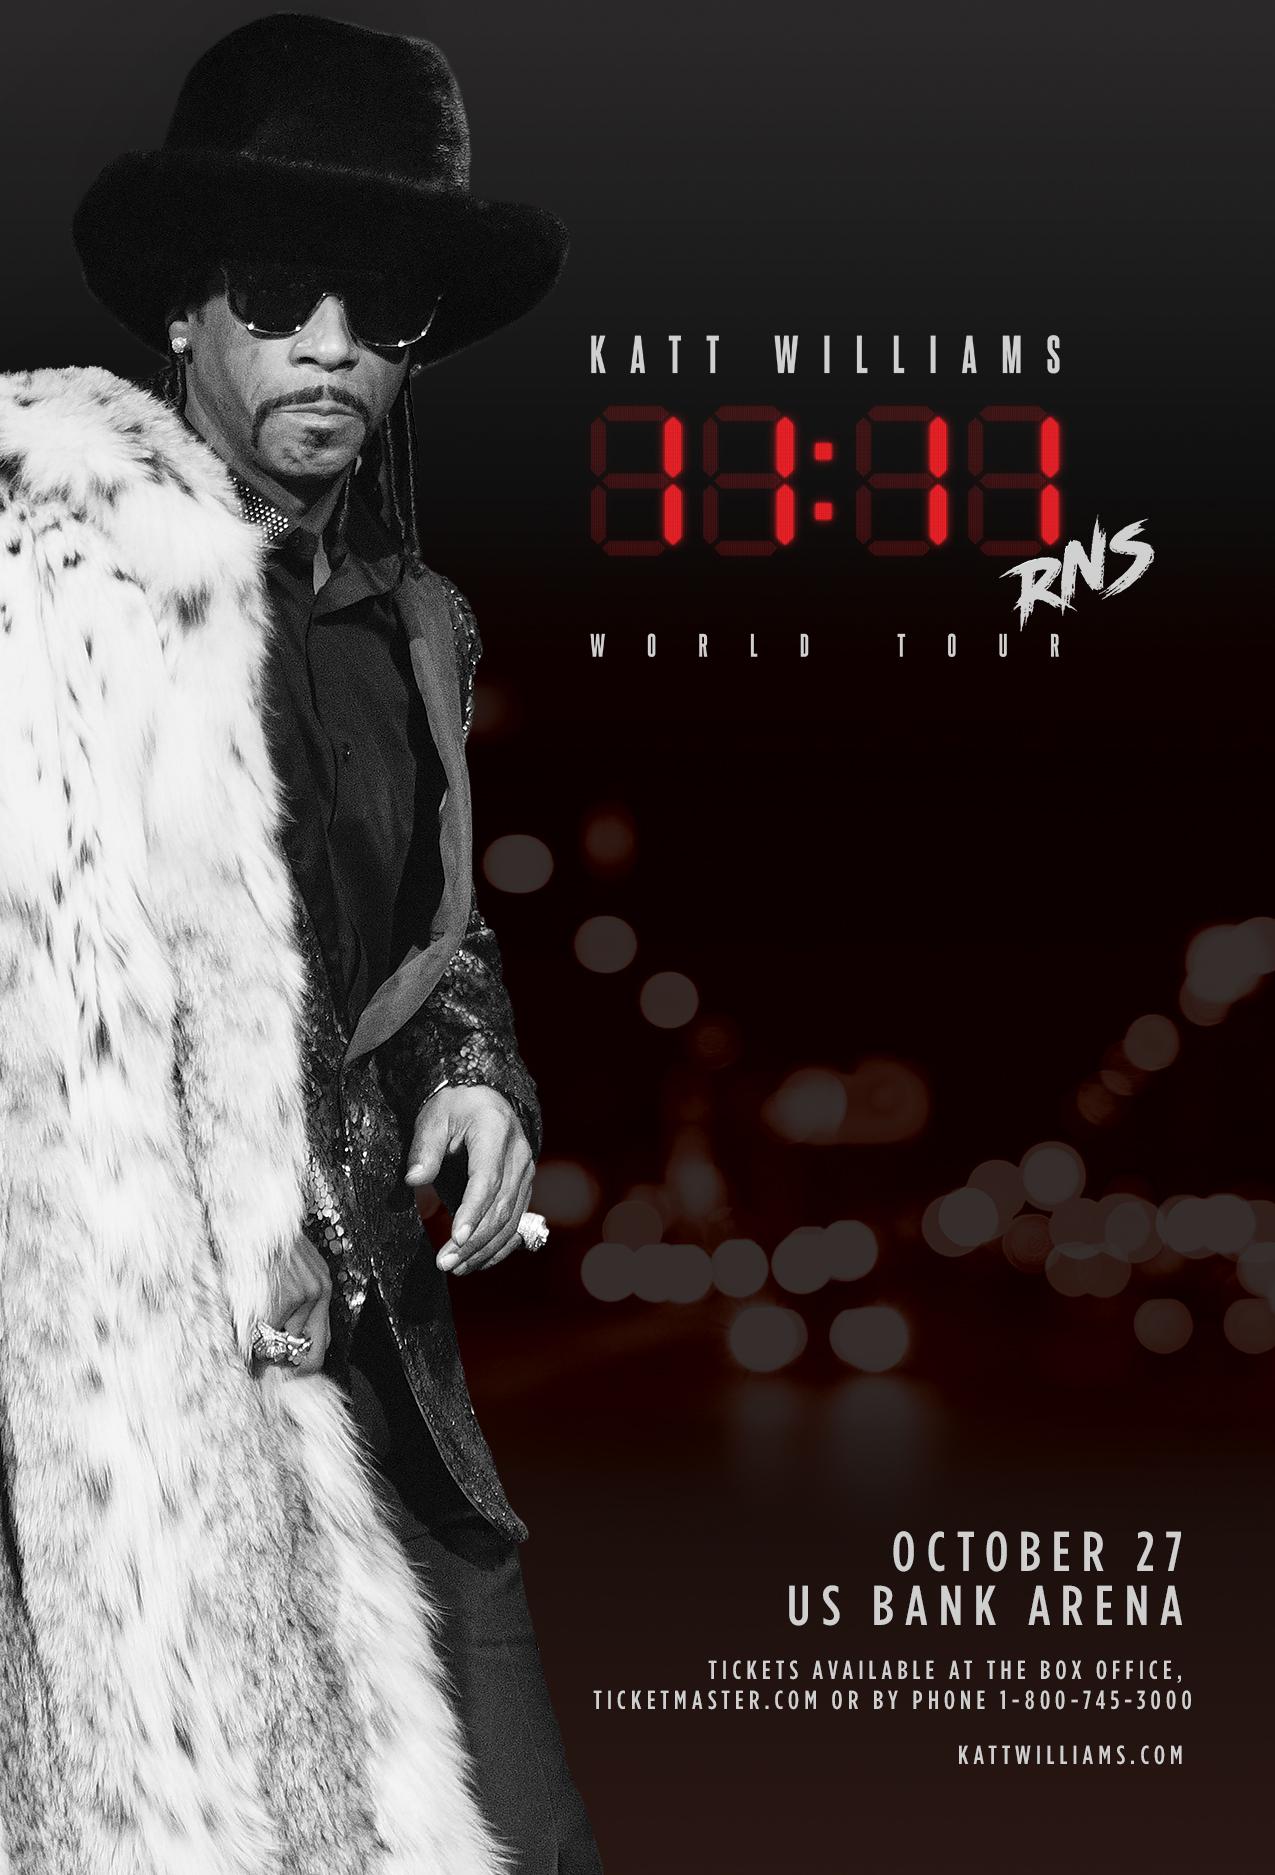 Katt Williams 11:11 RNS World Tour